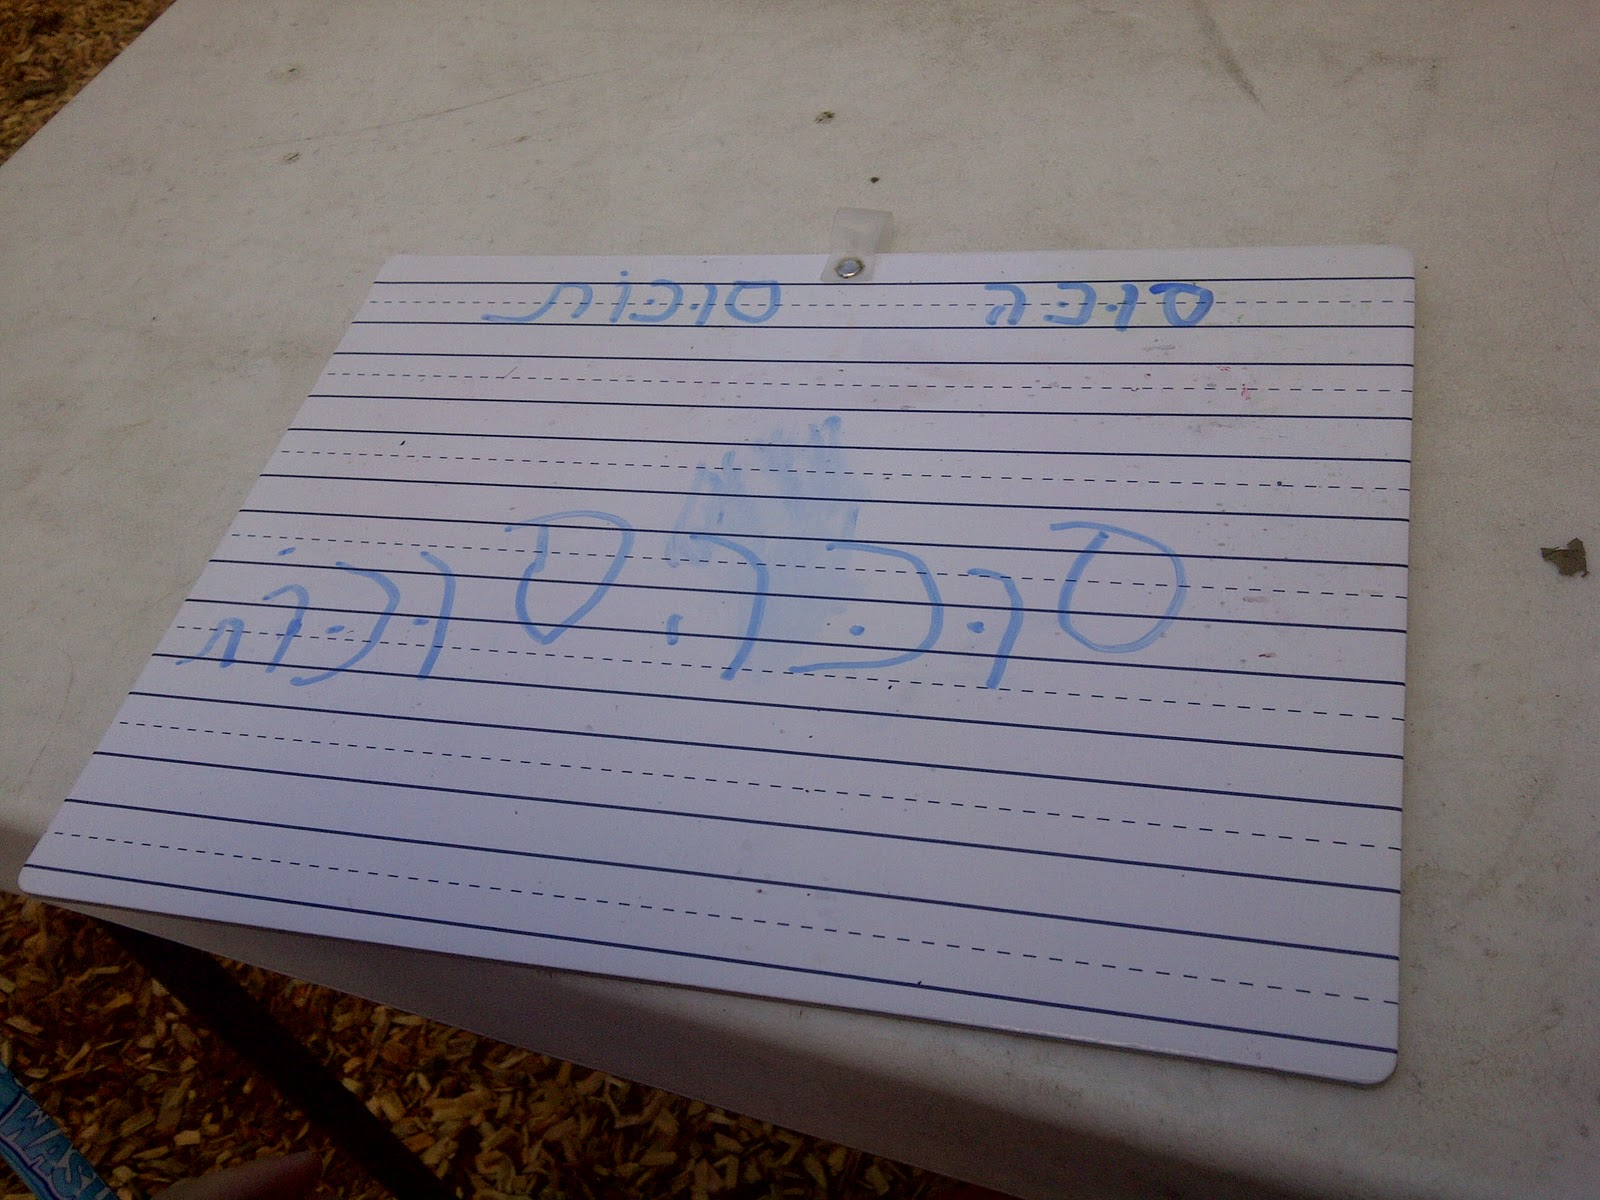 Lemalah How Do You Spell Sukkah